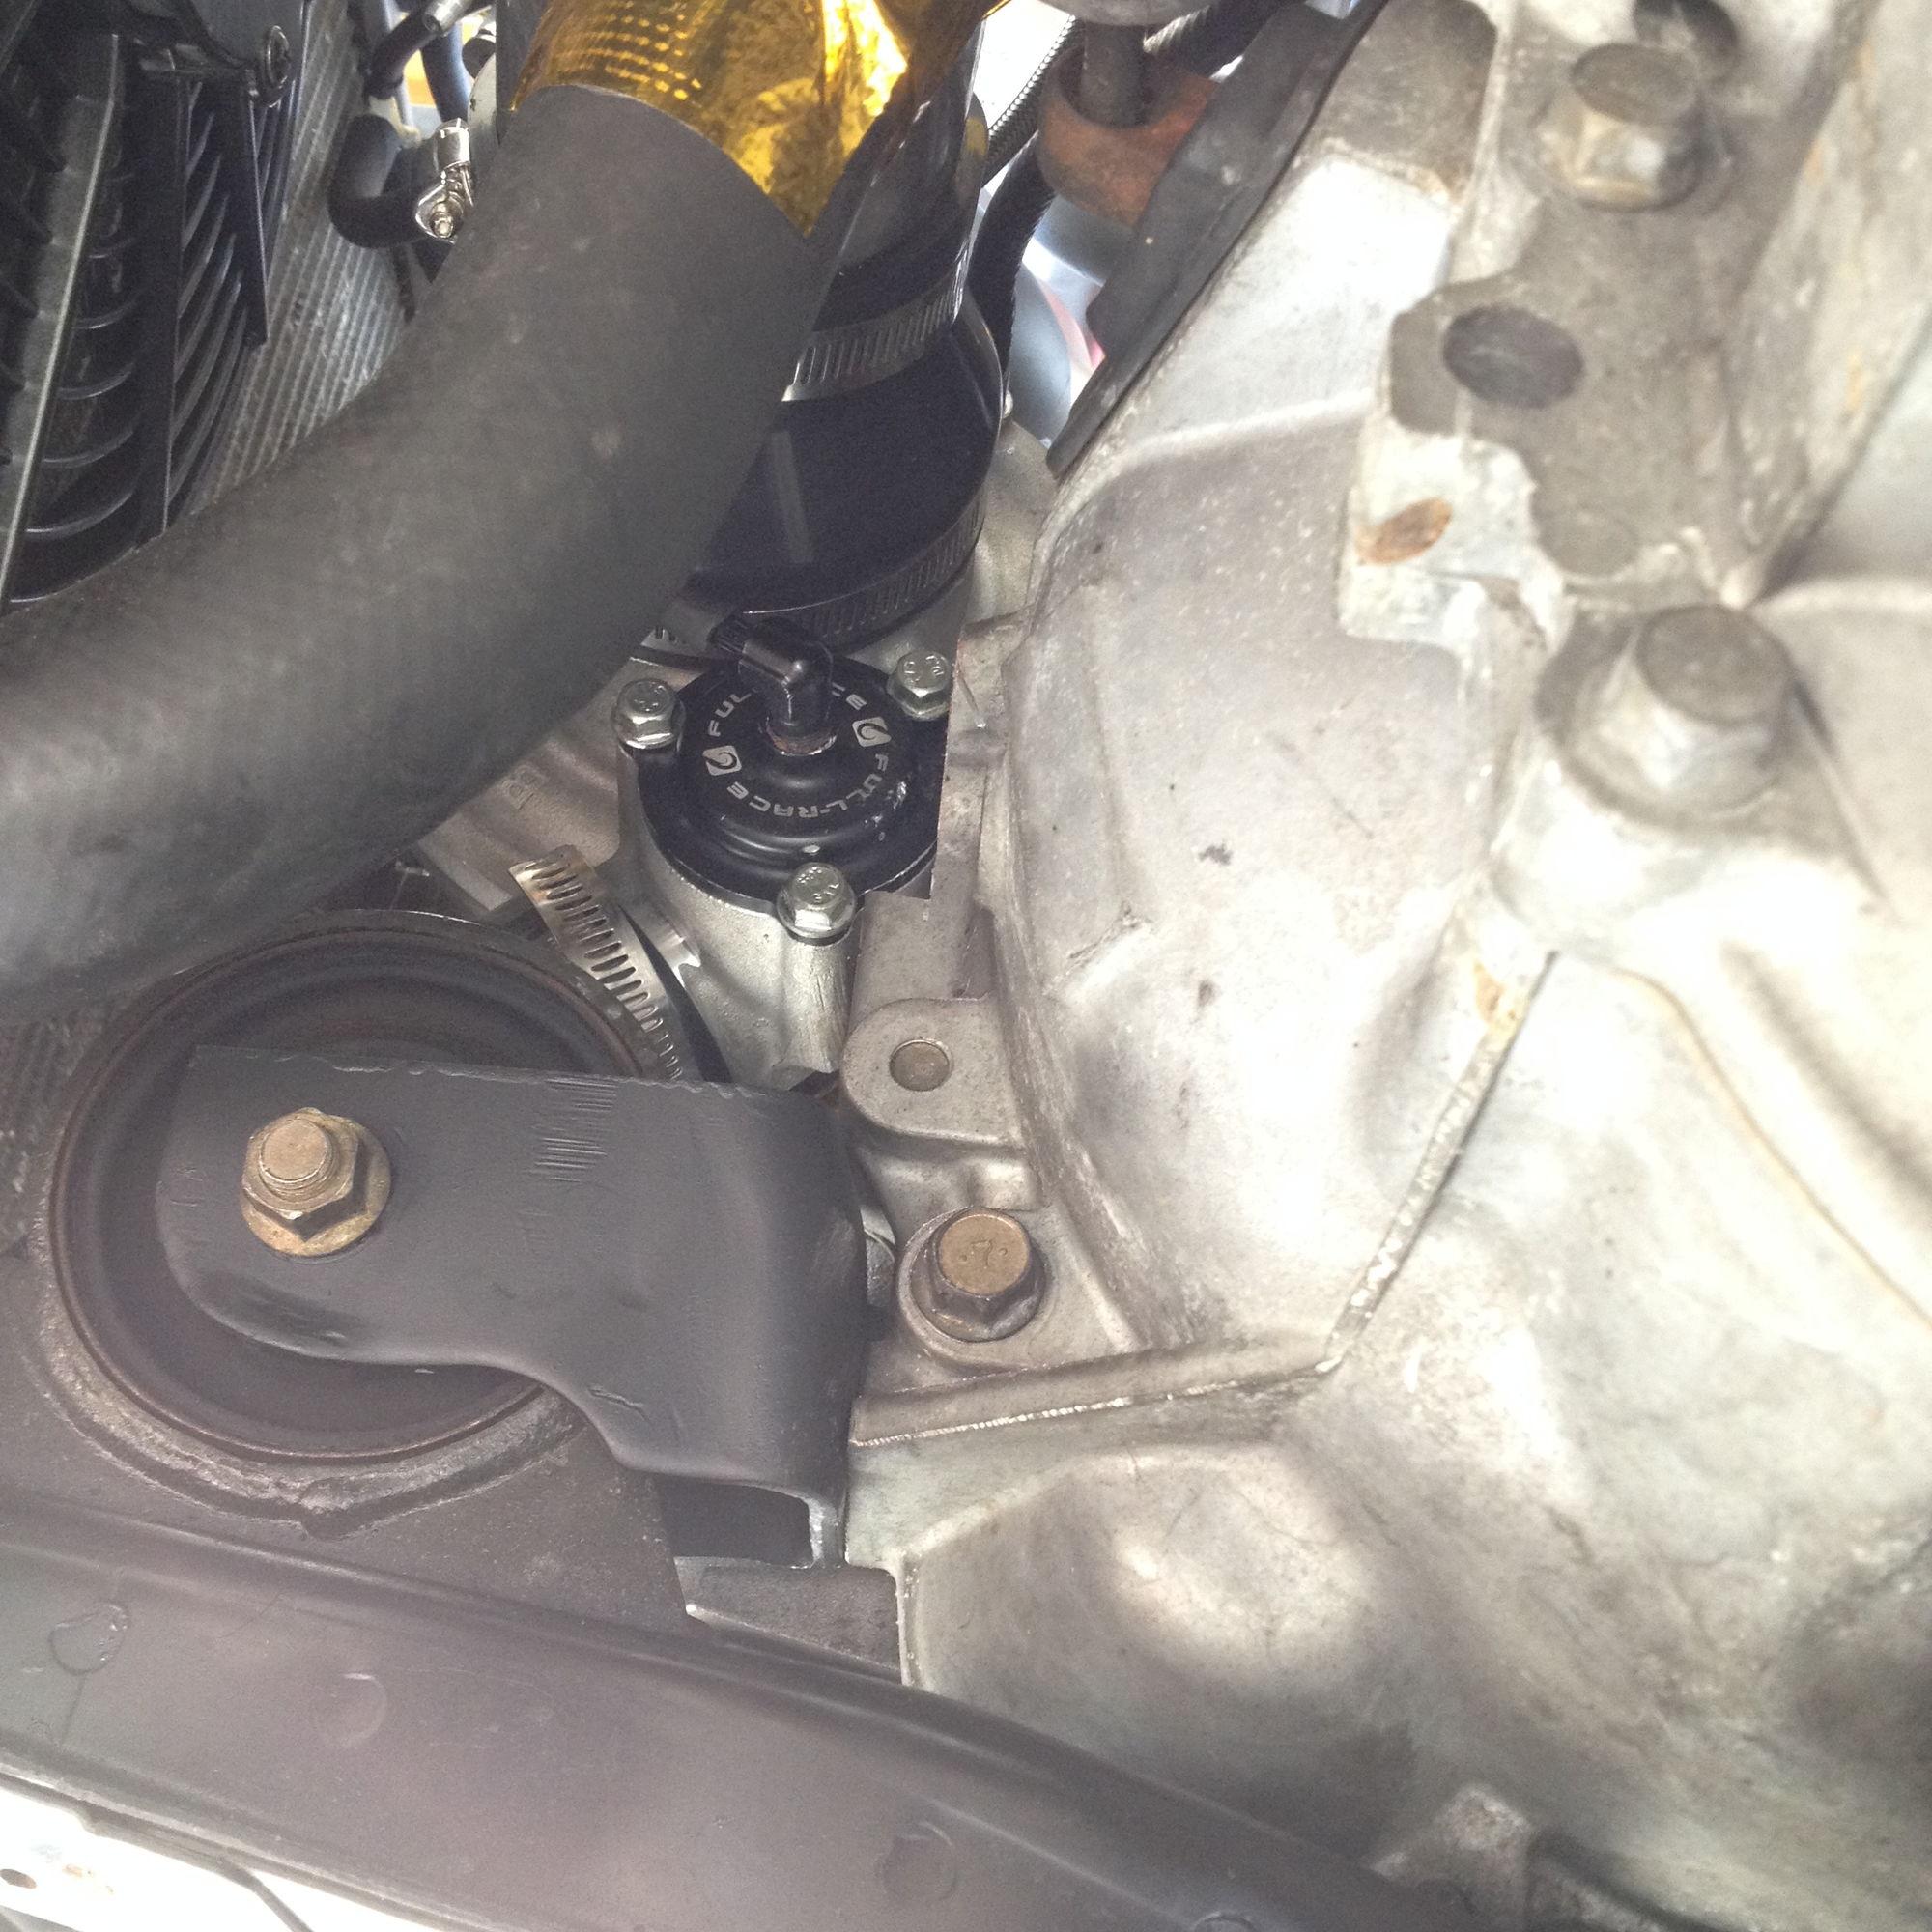 For Mitsubishi Lancer 09 12 Intermotor Manifold Absolute: Full Race BW 7670 W/ EWG Install